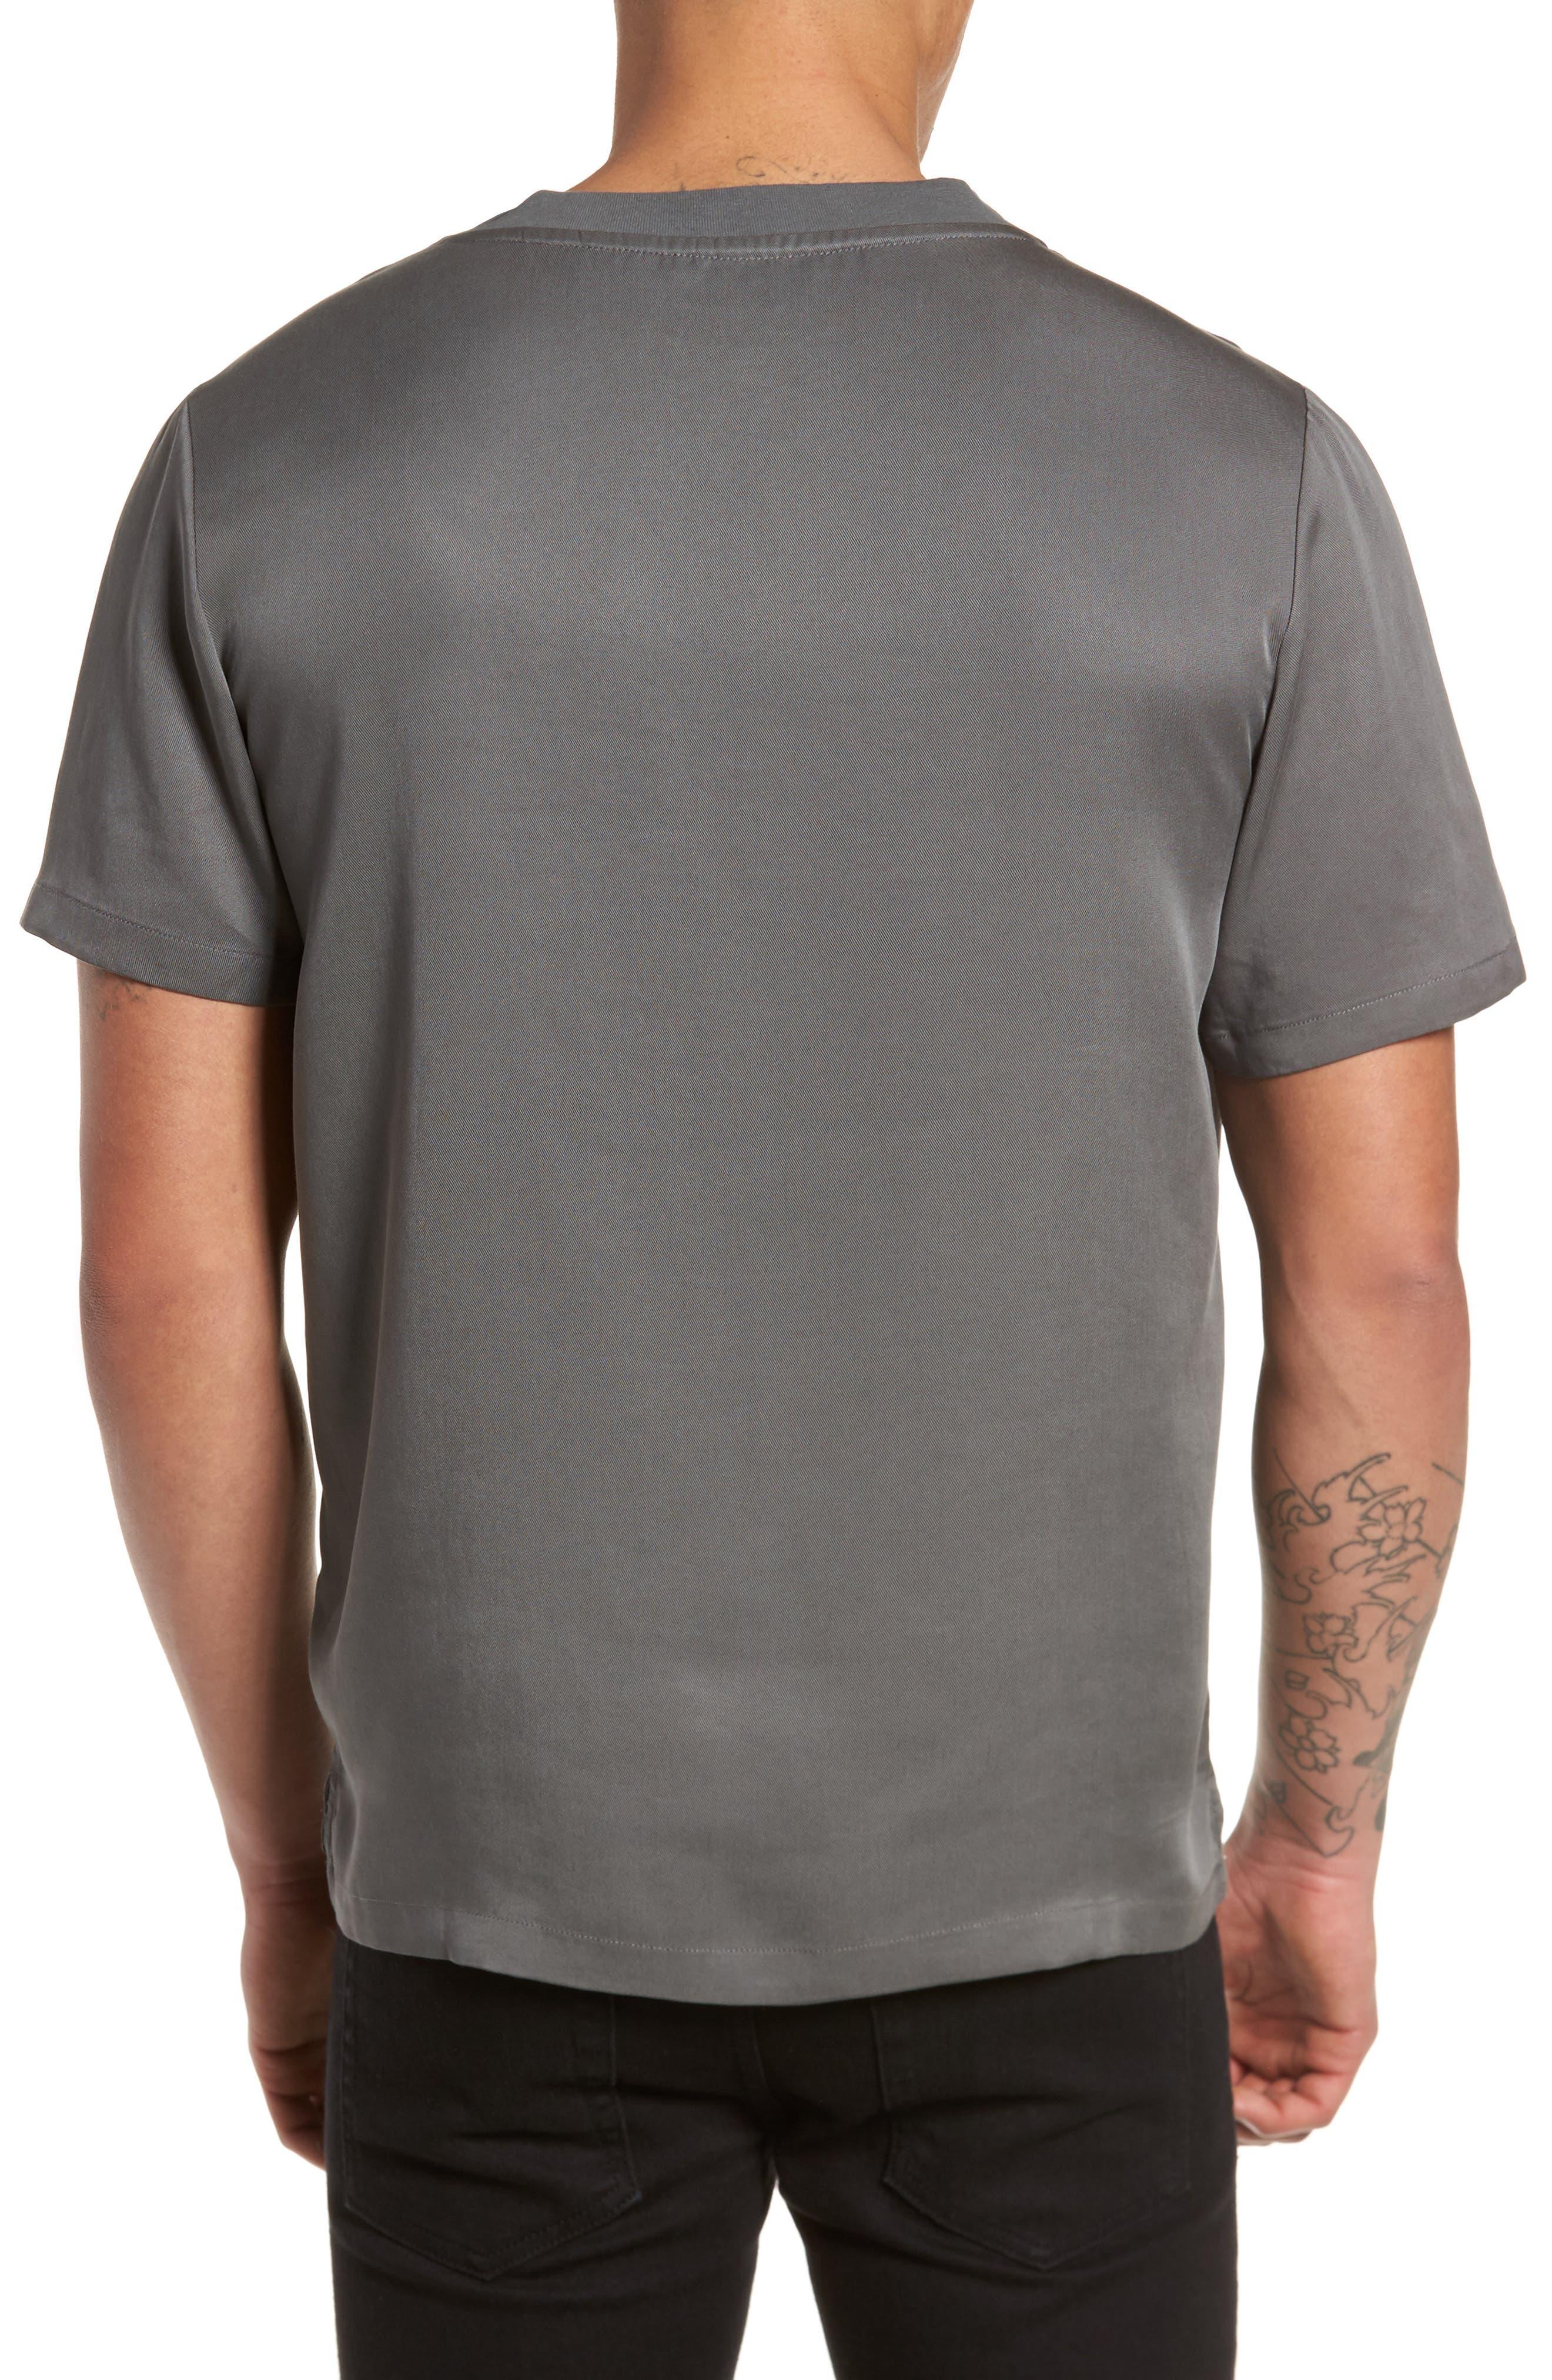 Denali Woven T-Shirt,                             Alternate thumbnail 2, color,                             Grey